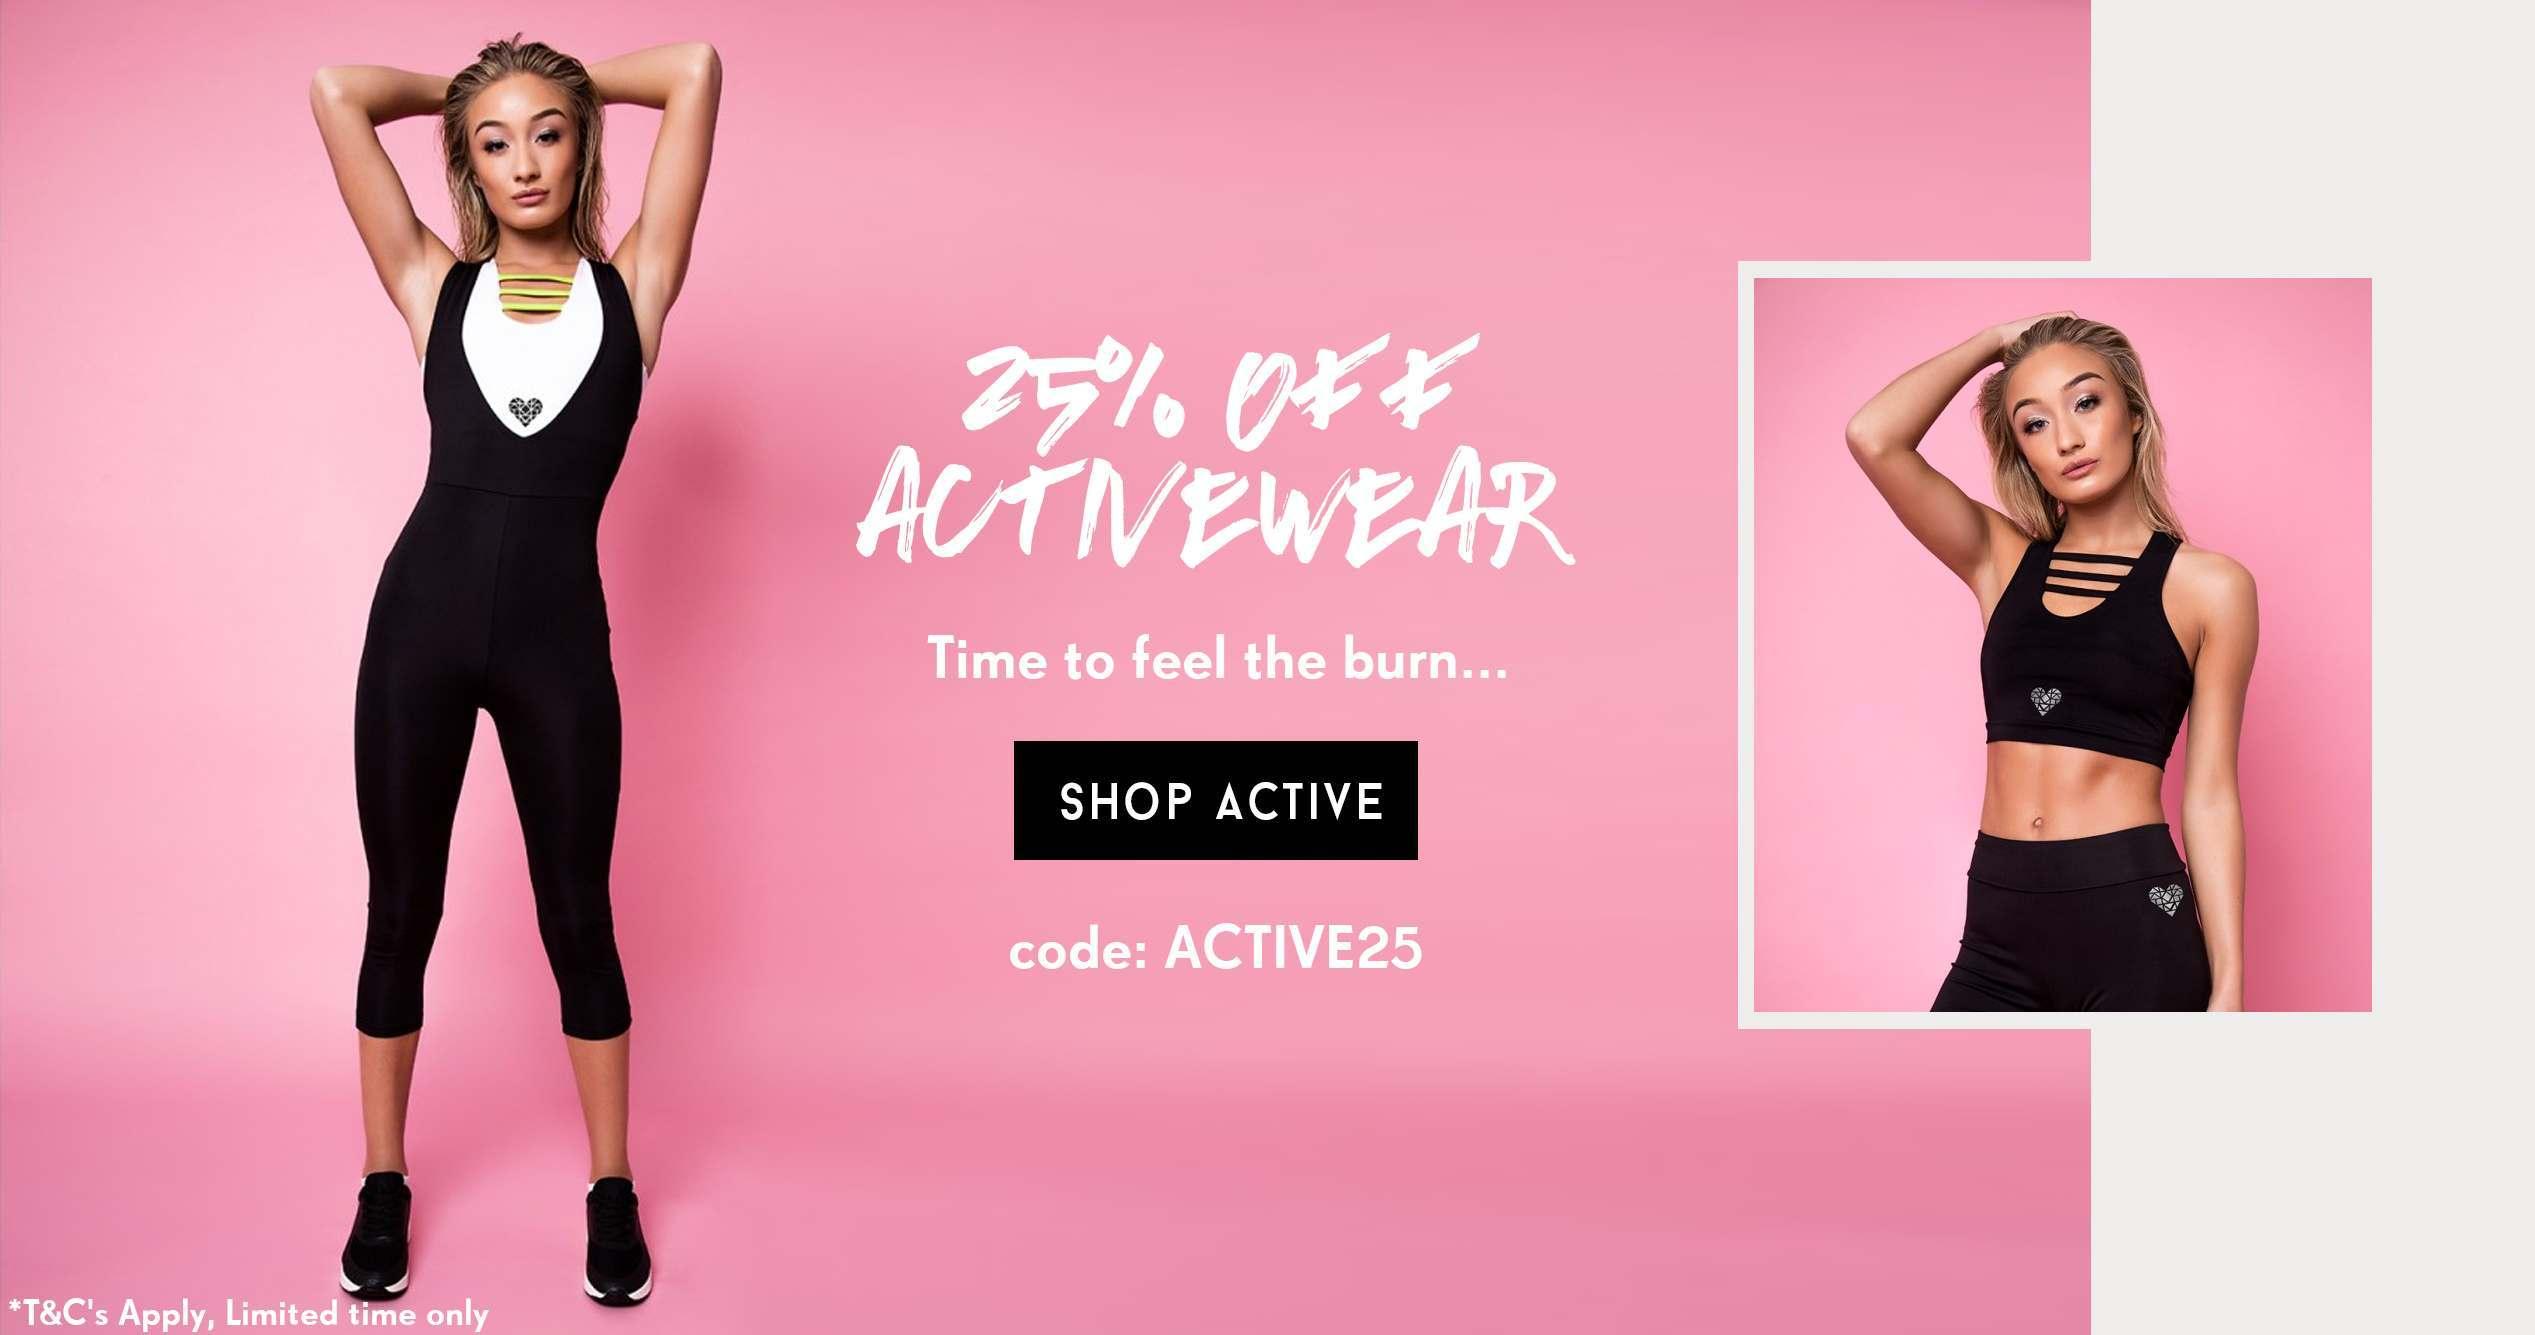 25% off activewear